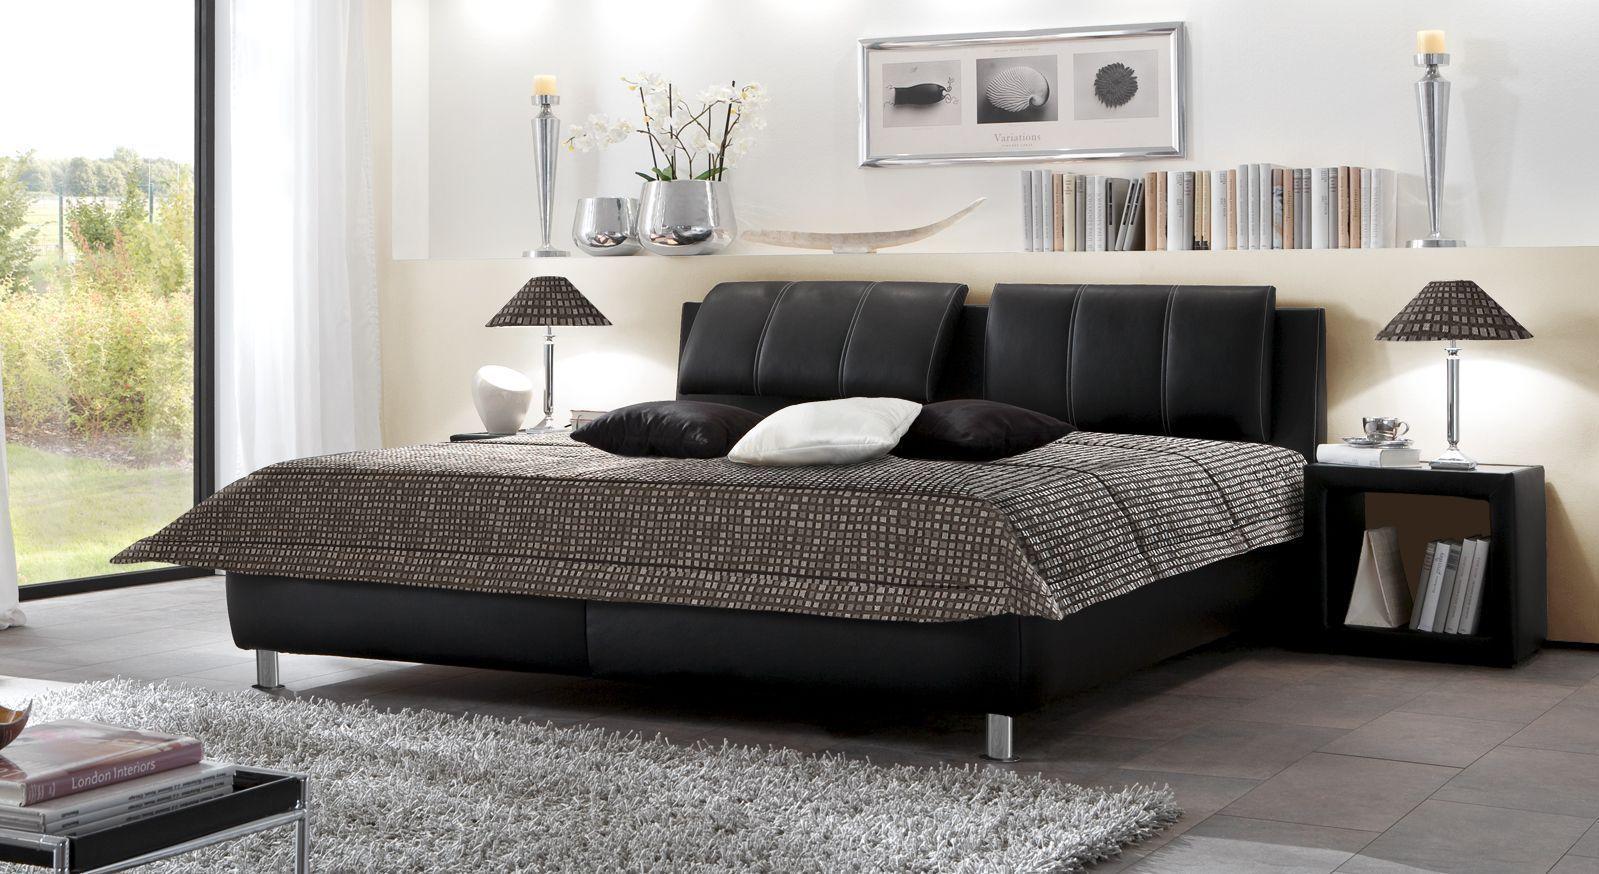 Lederbett Carisio schwarz modern Komfort